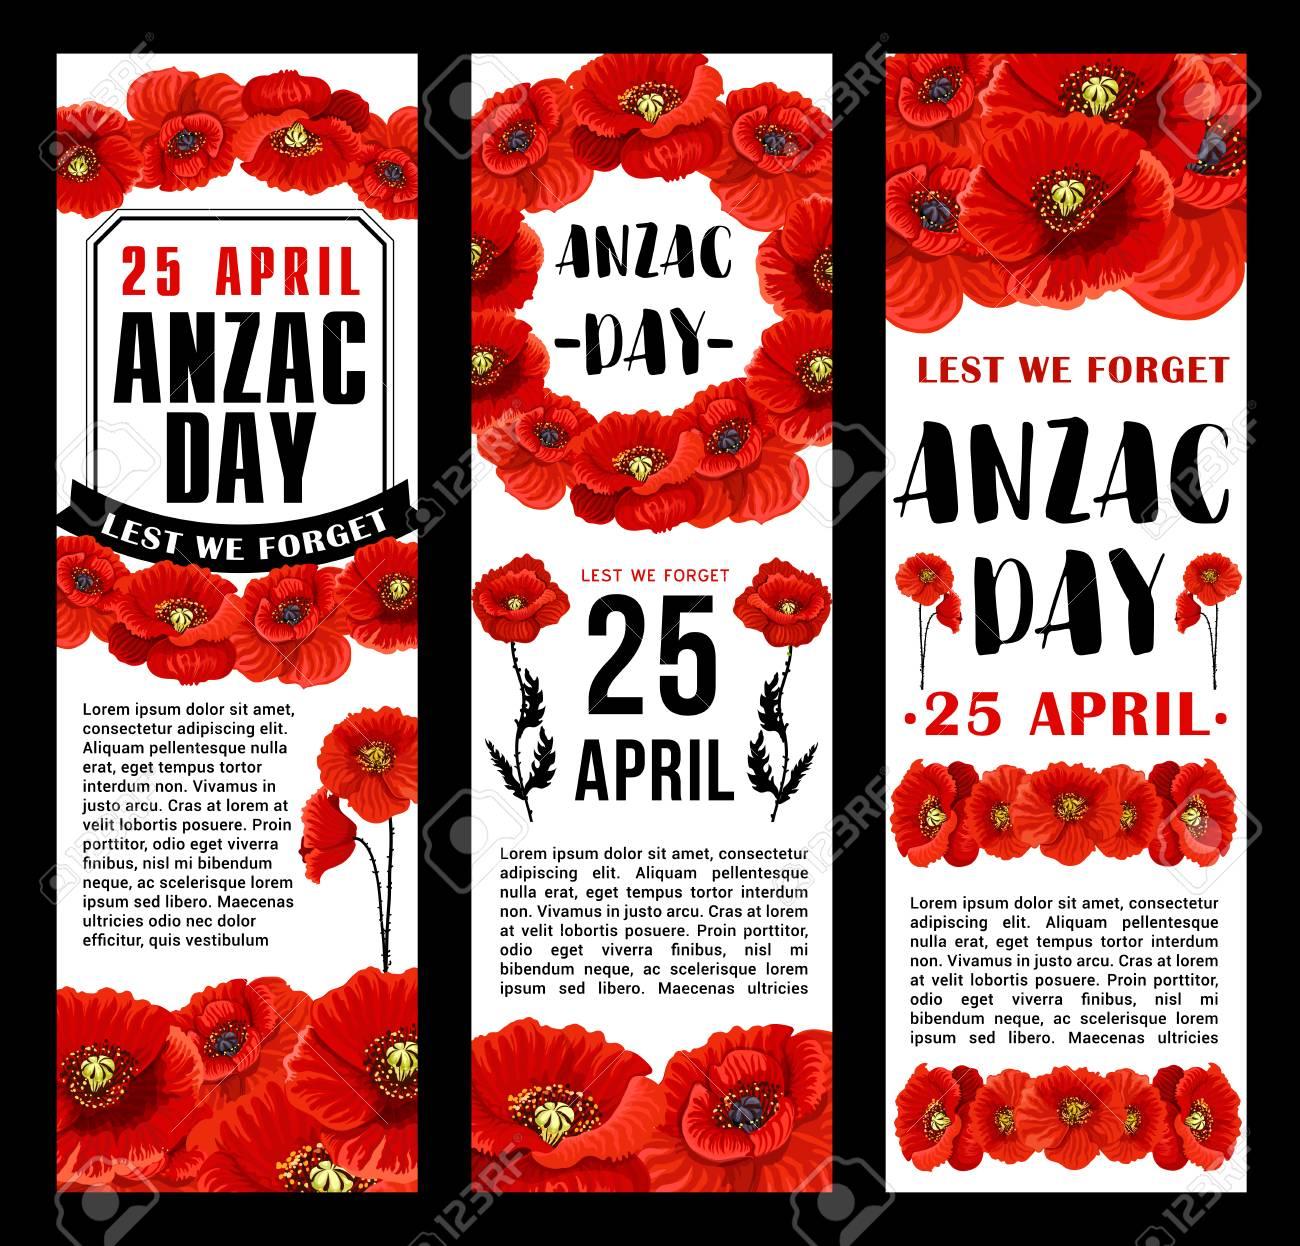 Anzac Day 25 April Australian Remembrance Day Banners Design